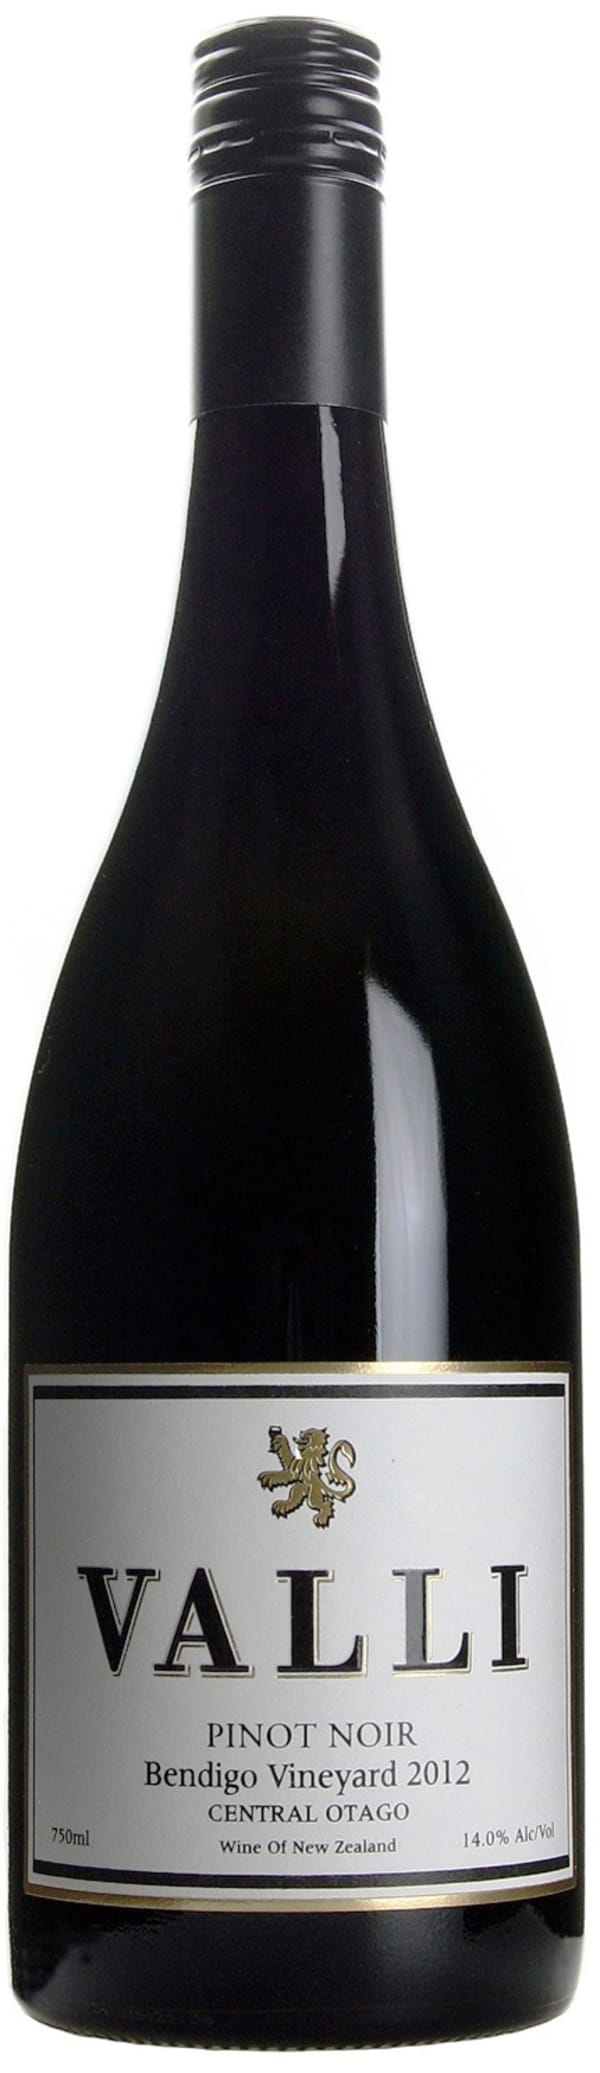 Valli Bendigo Vineyard Pinot Noir 2012